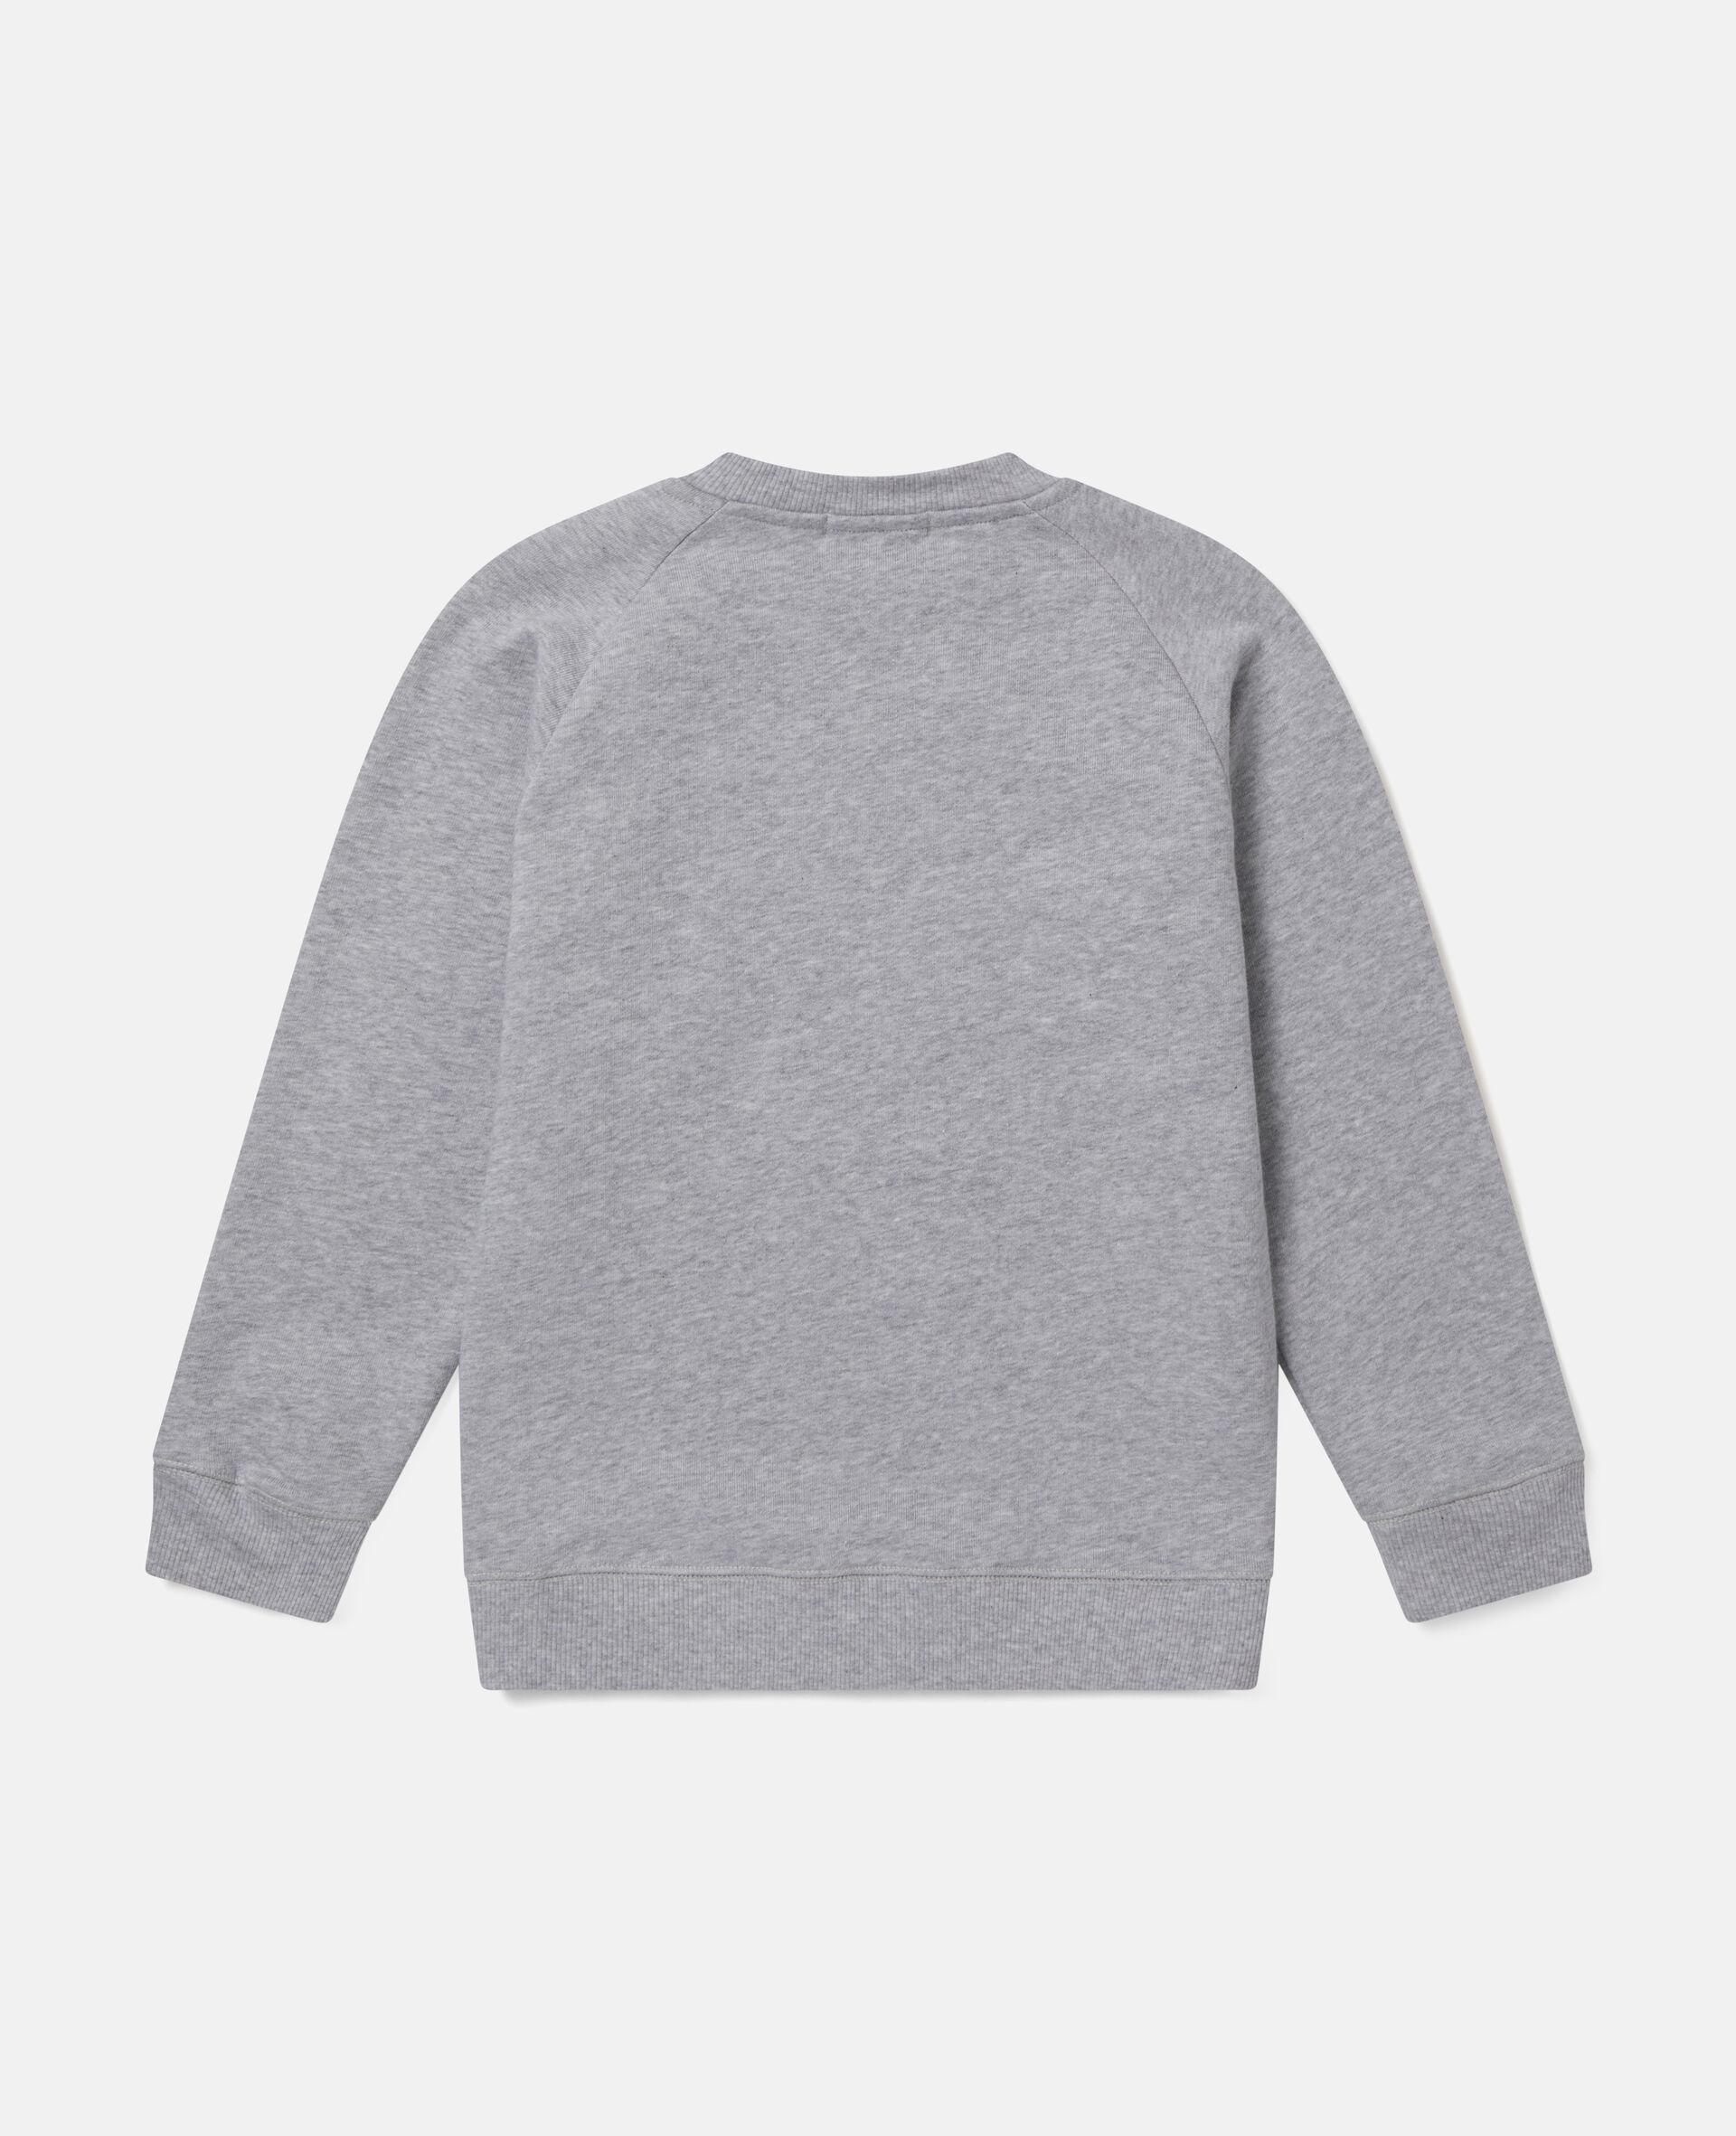 Daisy Heart Cotton Fleece Sweatshirt -Grey-large image number 2